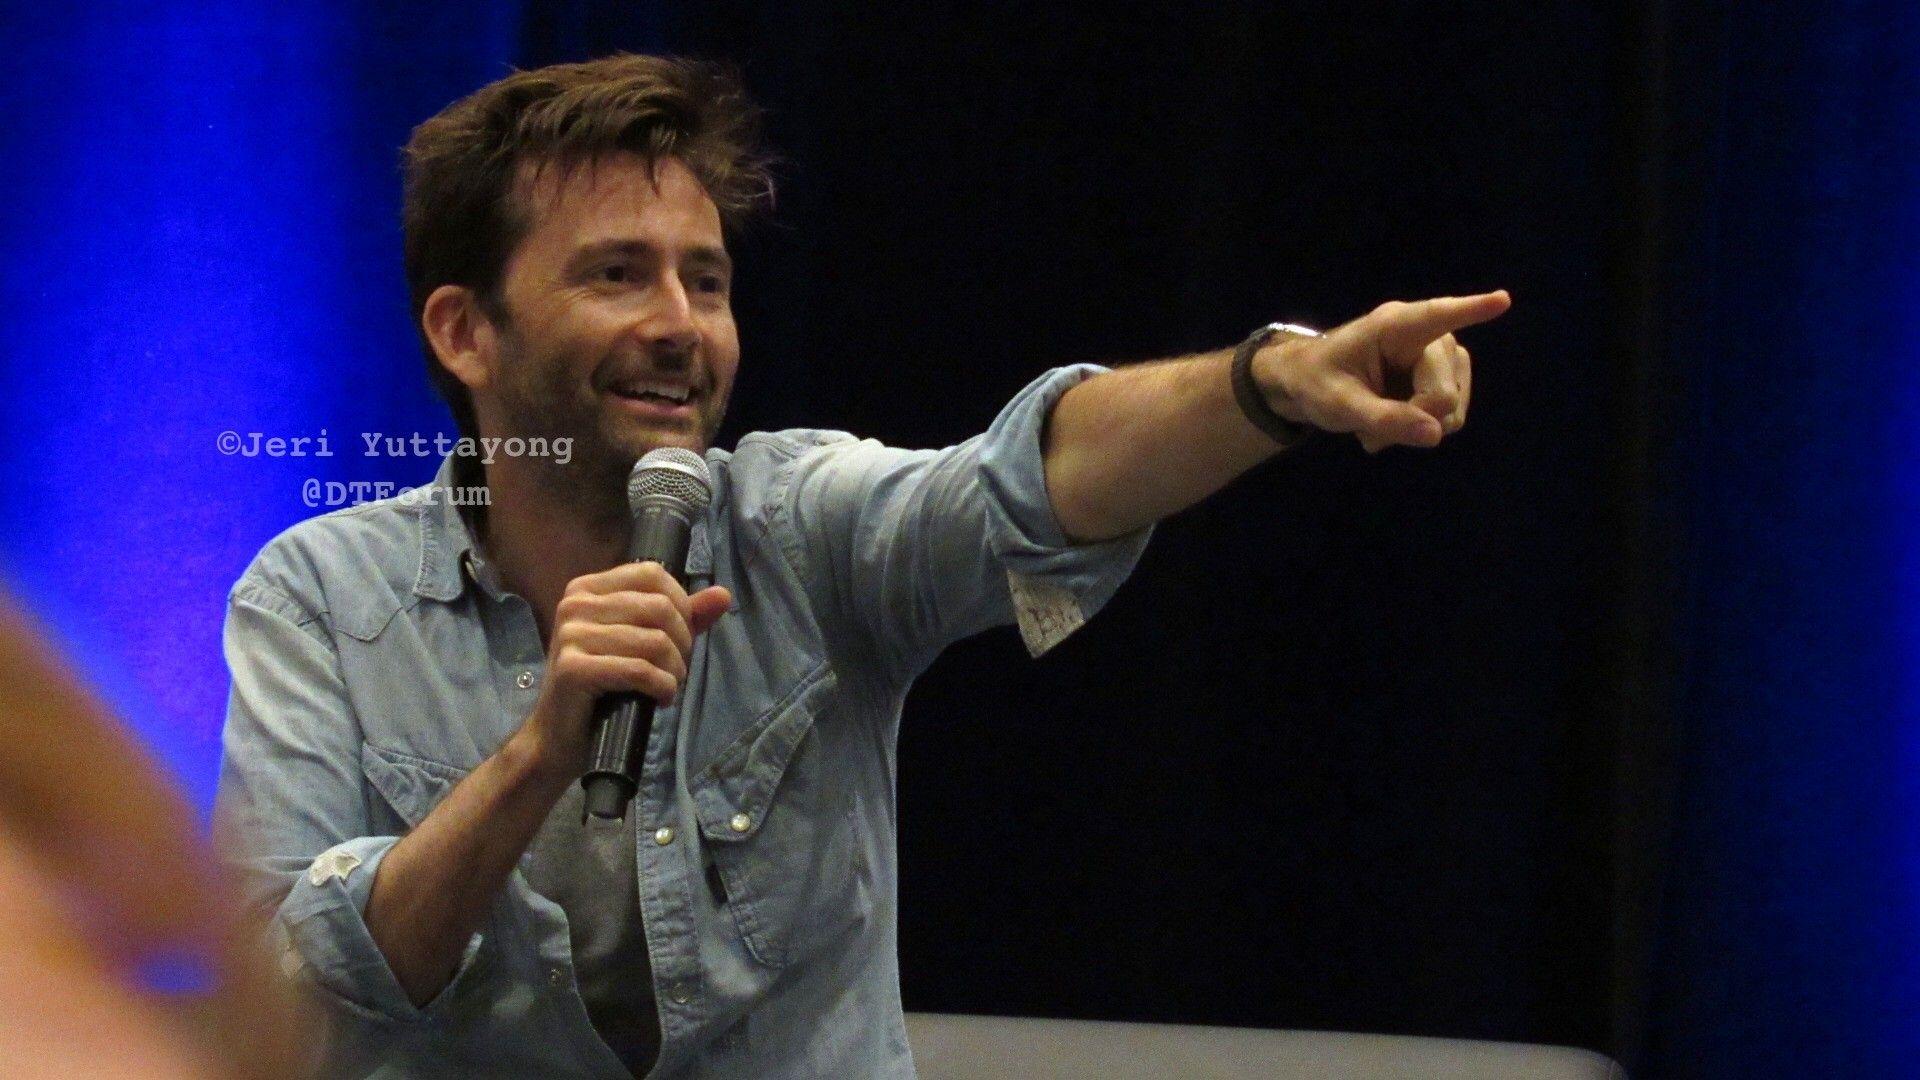 David at the Wizard World Comic Con in Columbus